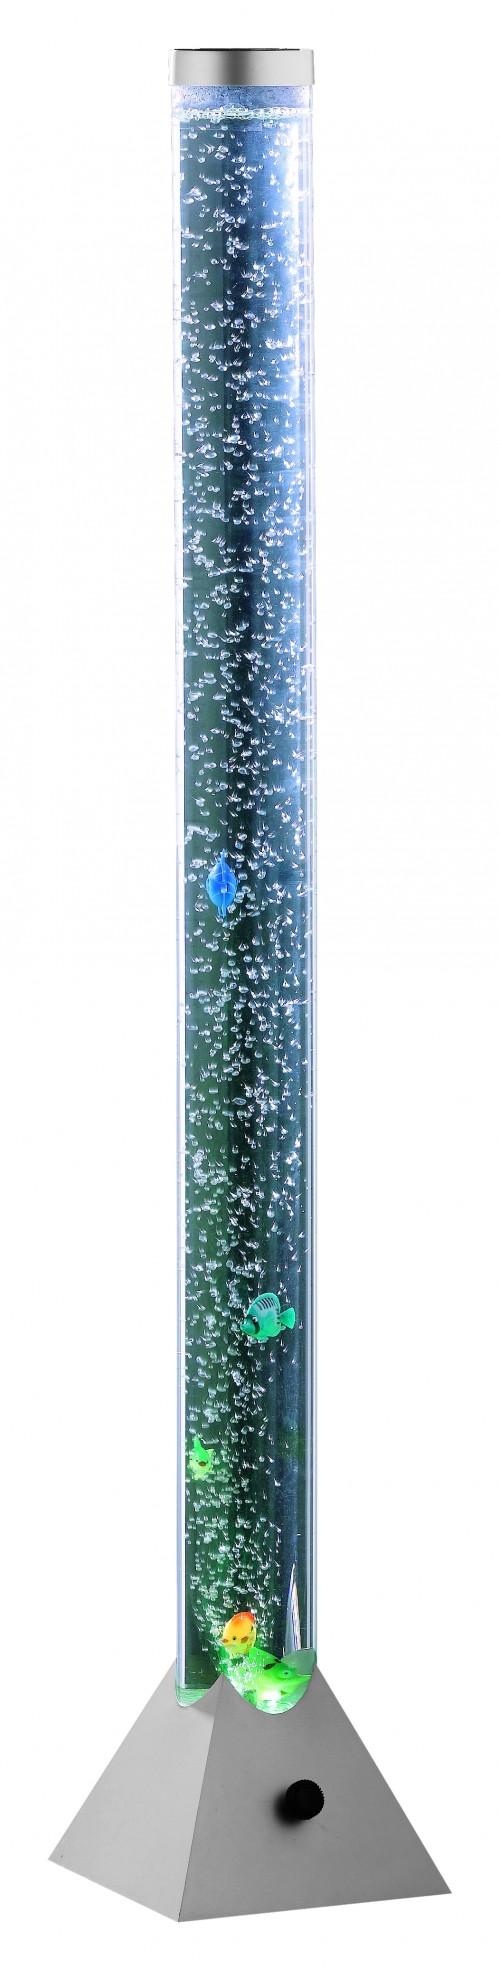 Lampadaire Aquario colonne Led RGB